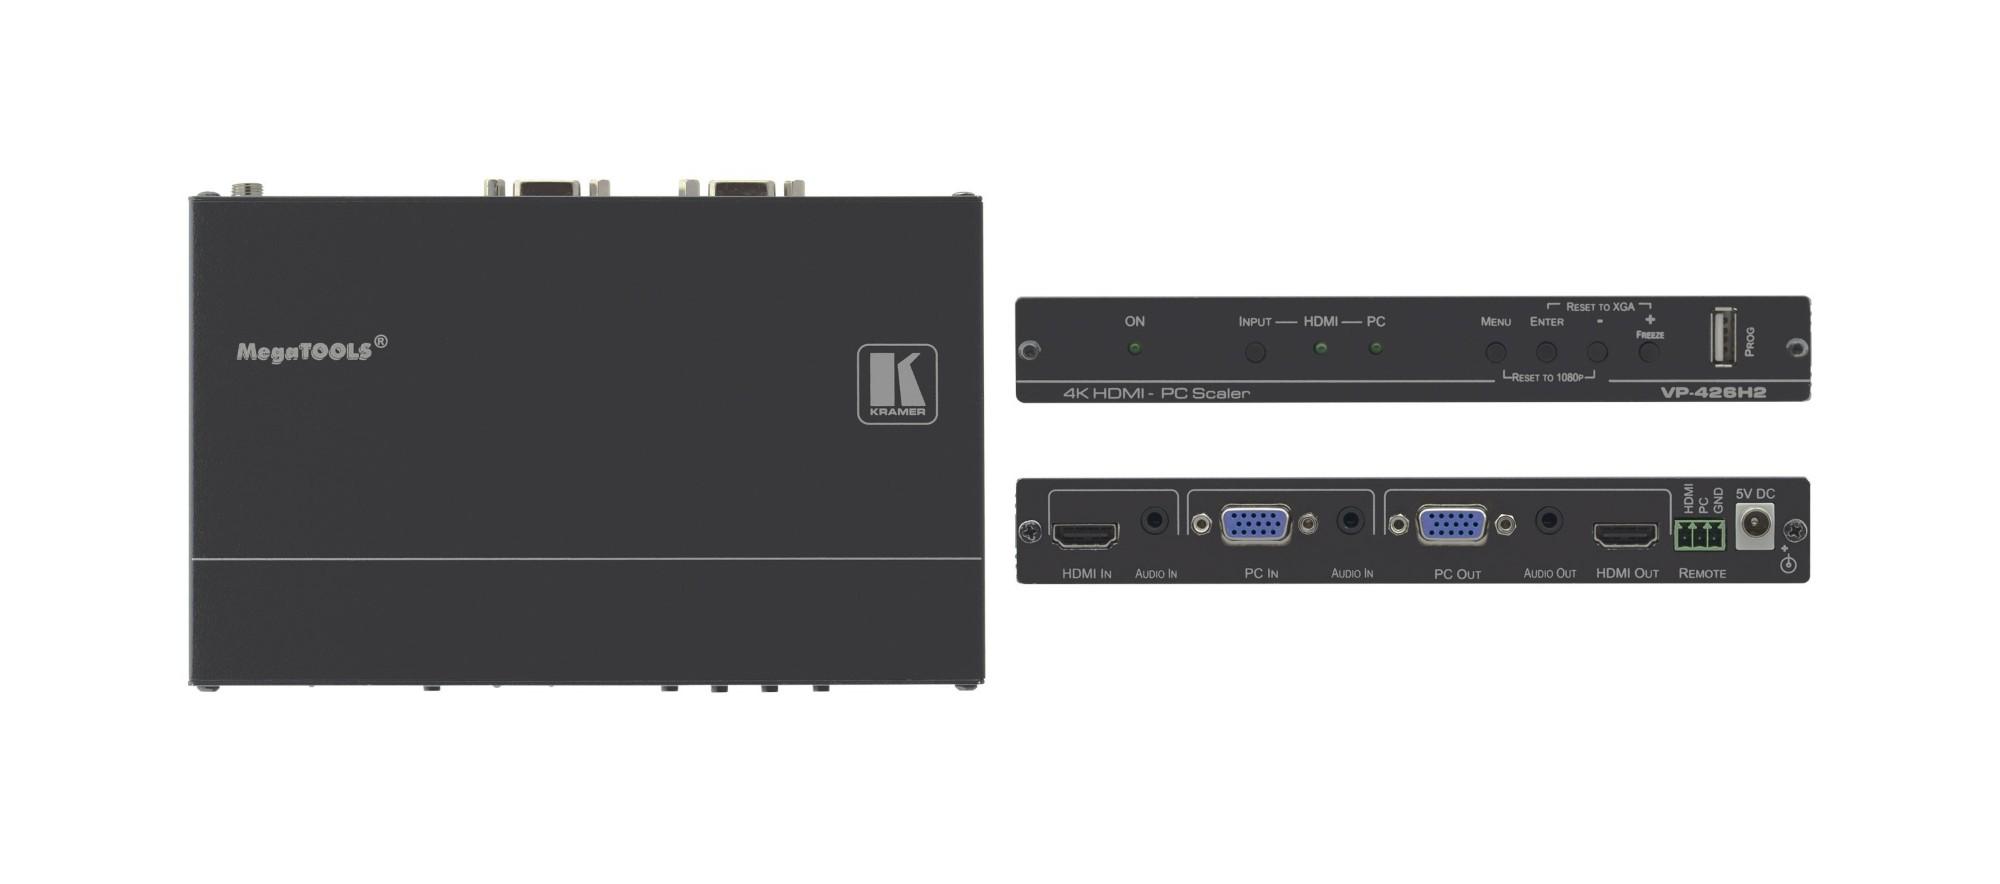 Kramer Electronics VP-426H2 escalador de vídeo